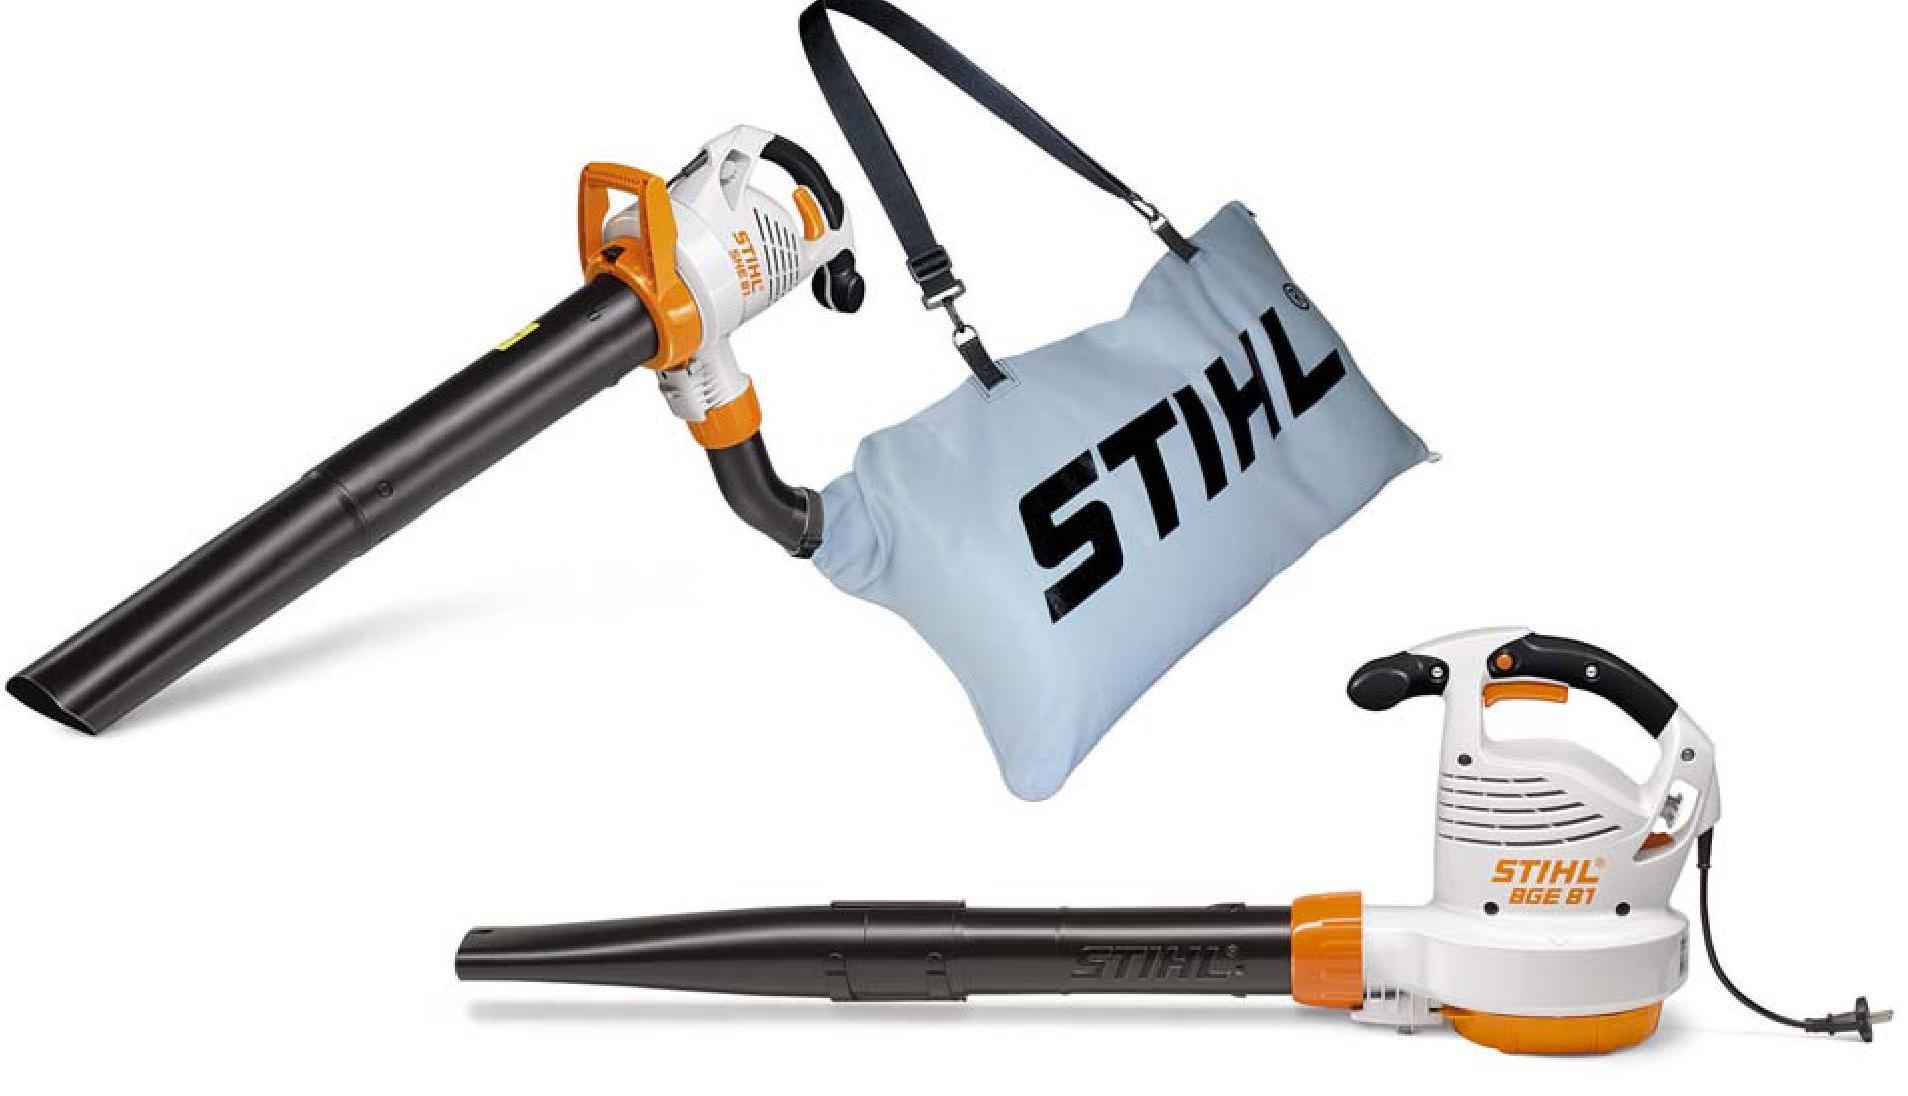 Stihl SHE 71 leaf blower with vacuum attachment